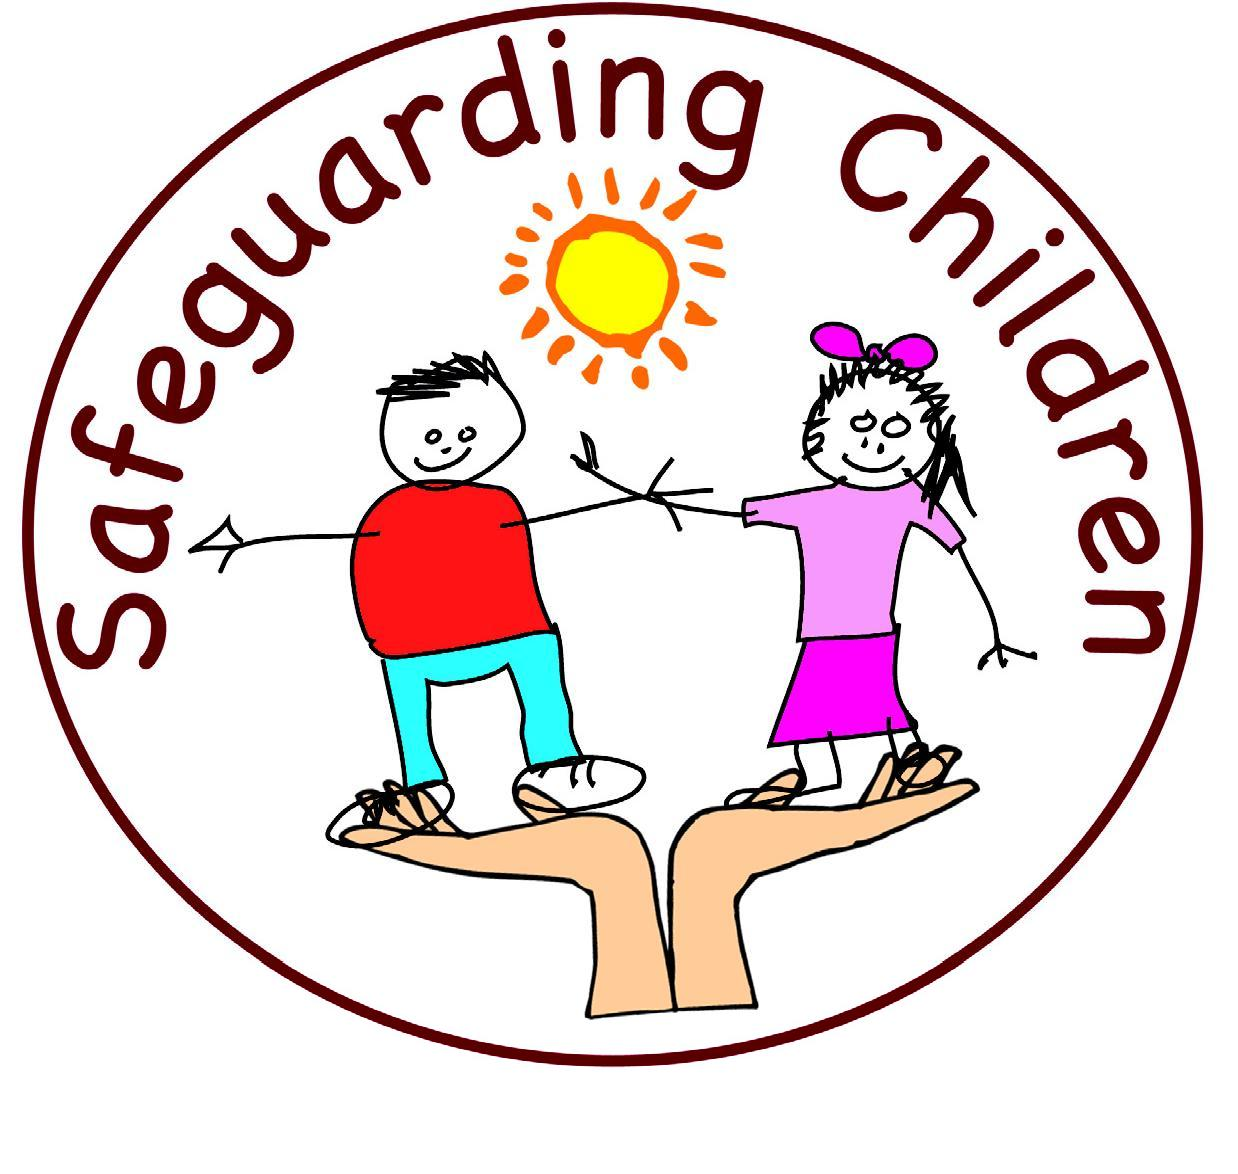 Child helping a child to be safe clipart jpg free download KEEPING CHILDREN SAFE 2 (under construction) | Foxhills Junior School jpg free download